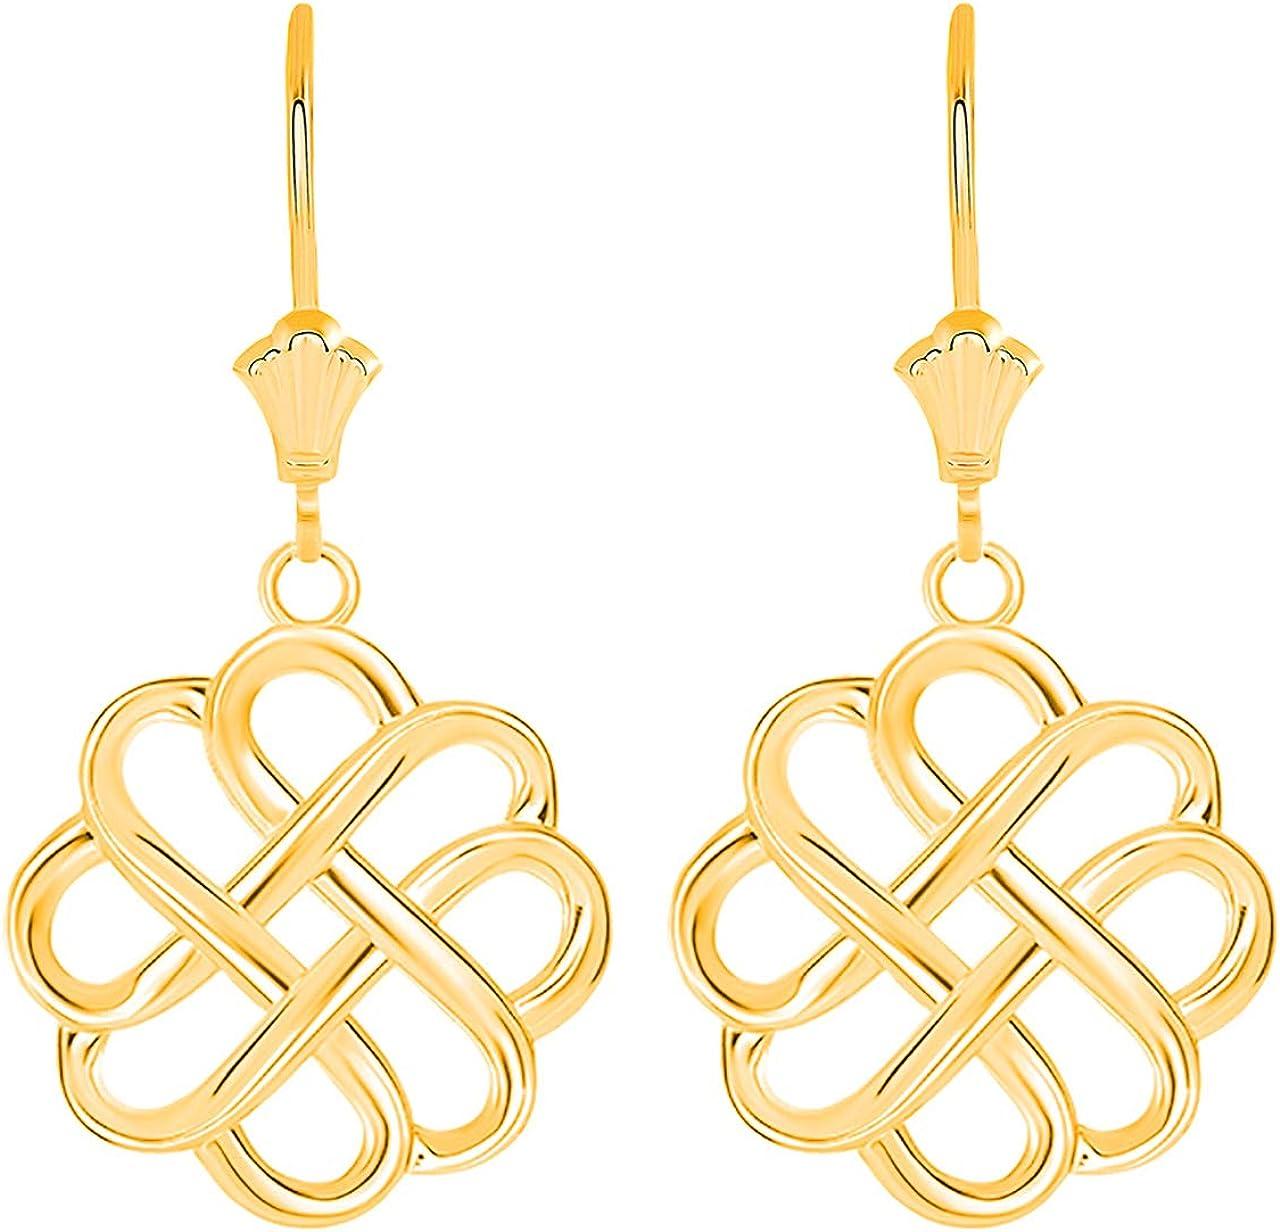 Certified Gold Endless Love 特売 《週末限定タイムセール》 Good Luck Knot Dangle Irish Celtic E